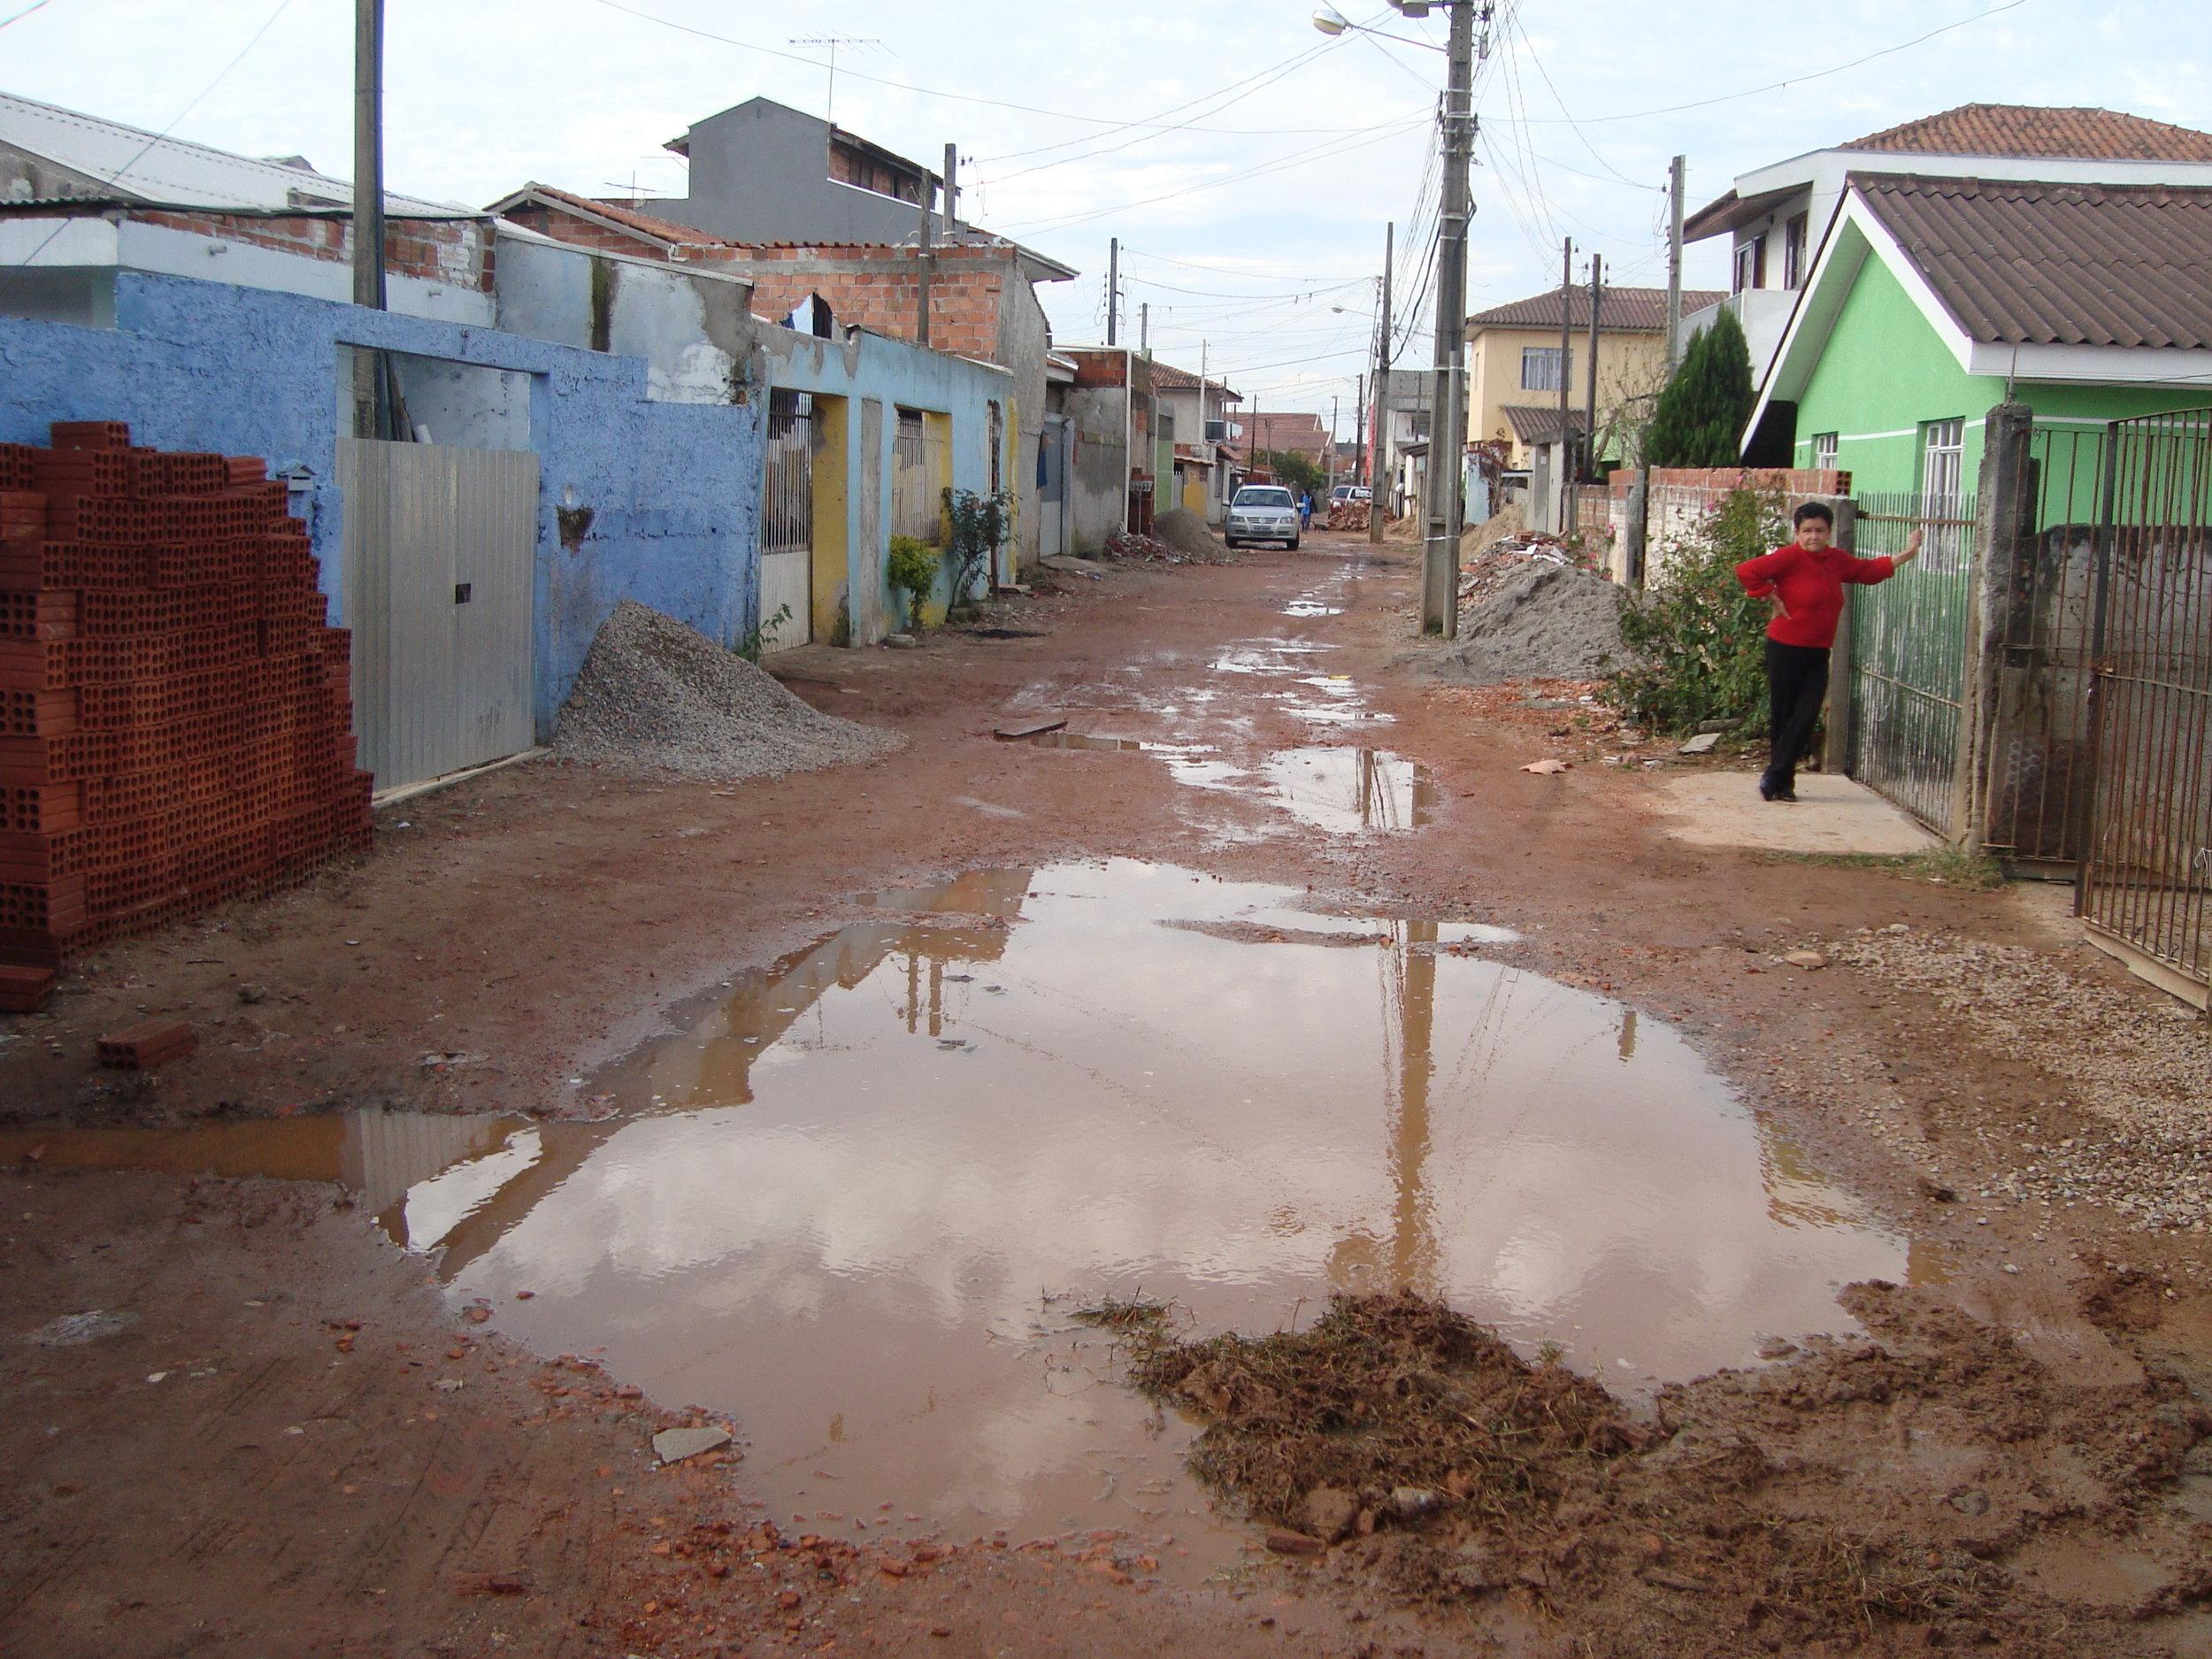 Rua Jornalista Luiz Carlos Cavalcante, São JOão Del'Rey - ANTES